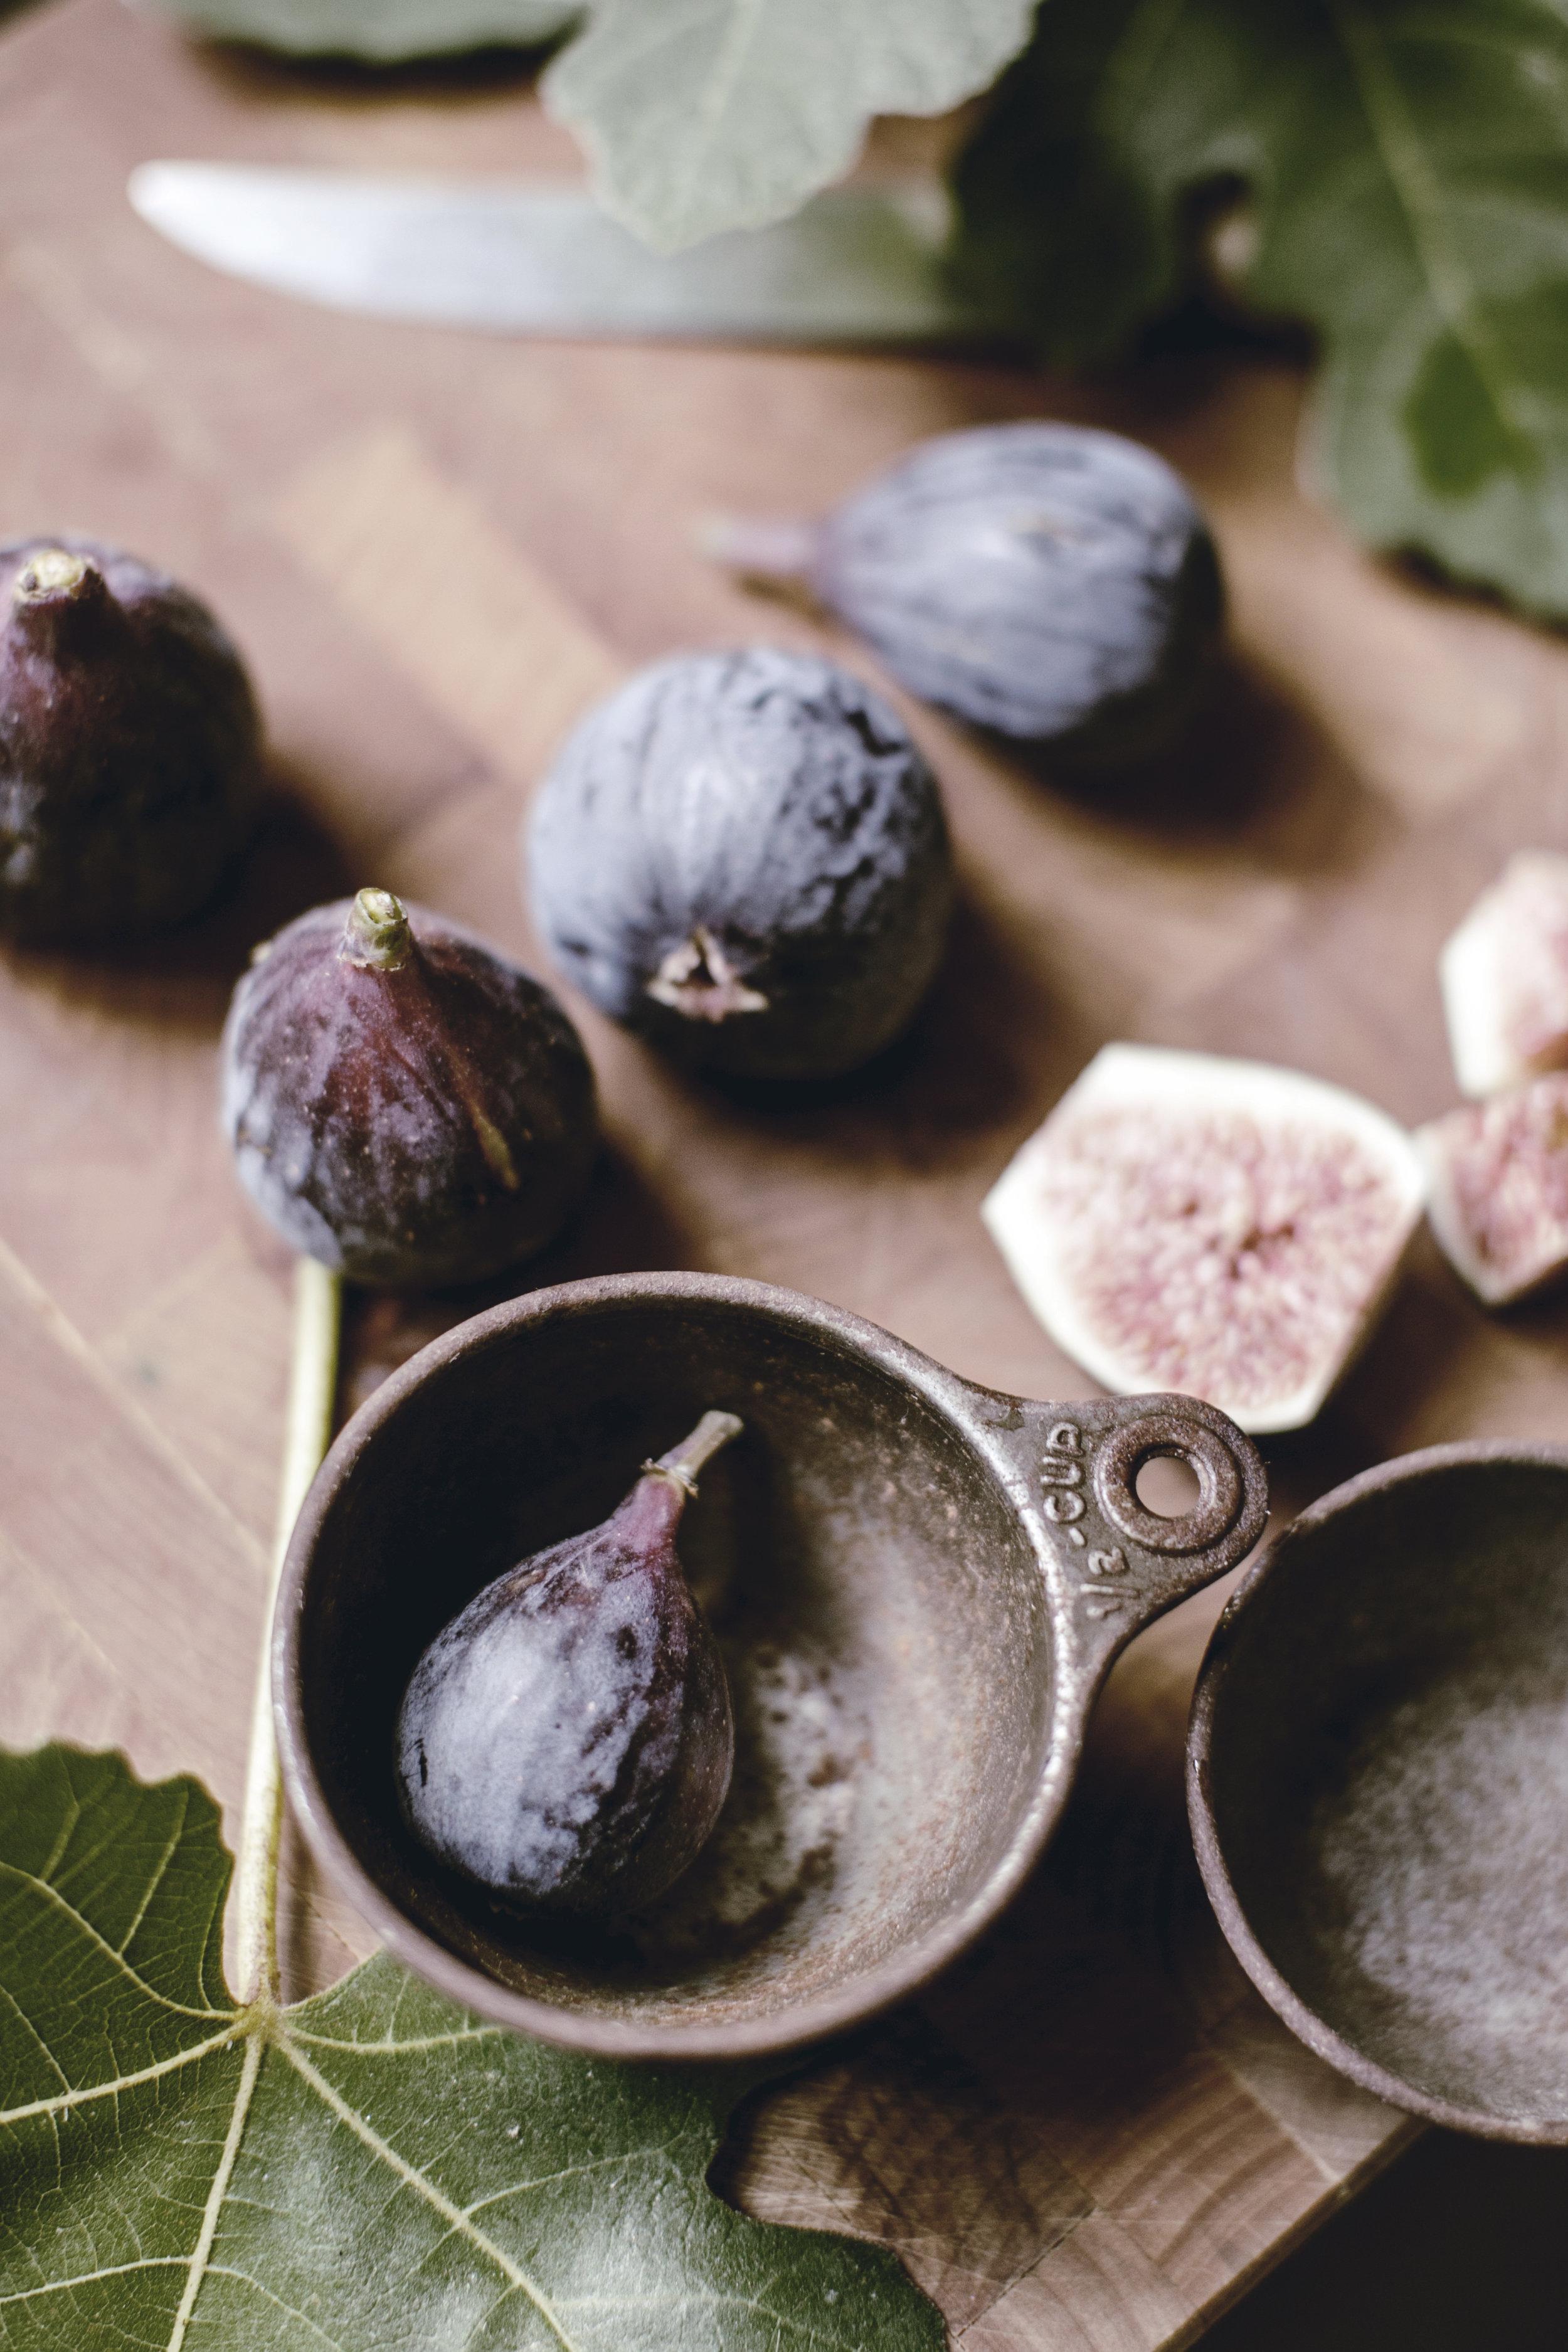 ingredients for fresh fig jam / heirloomed